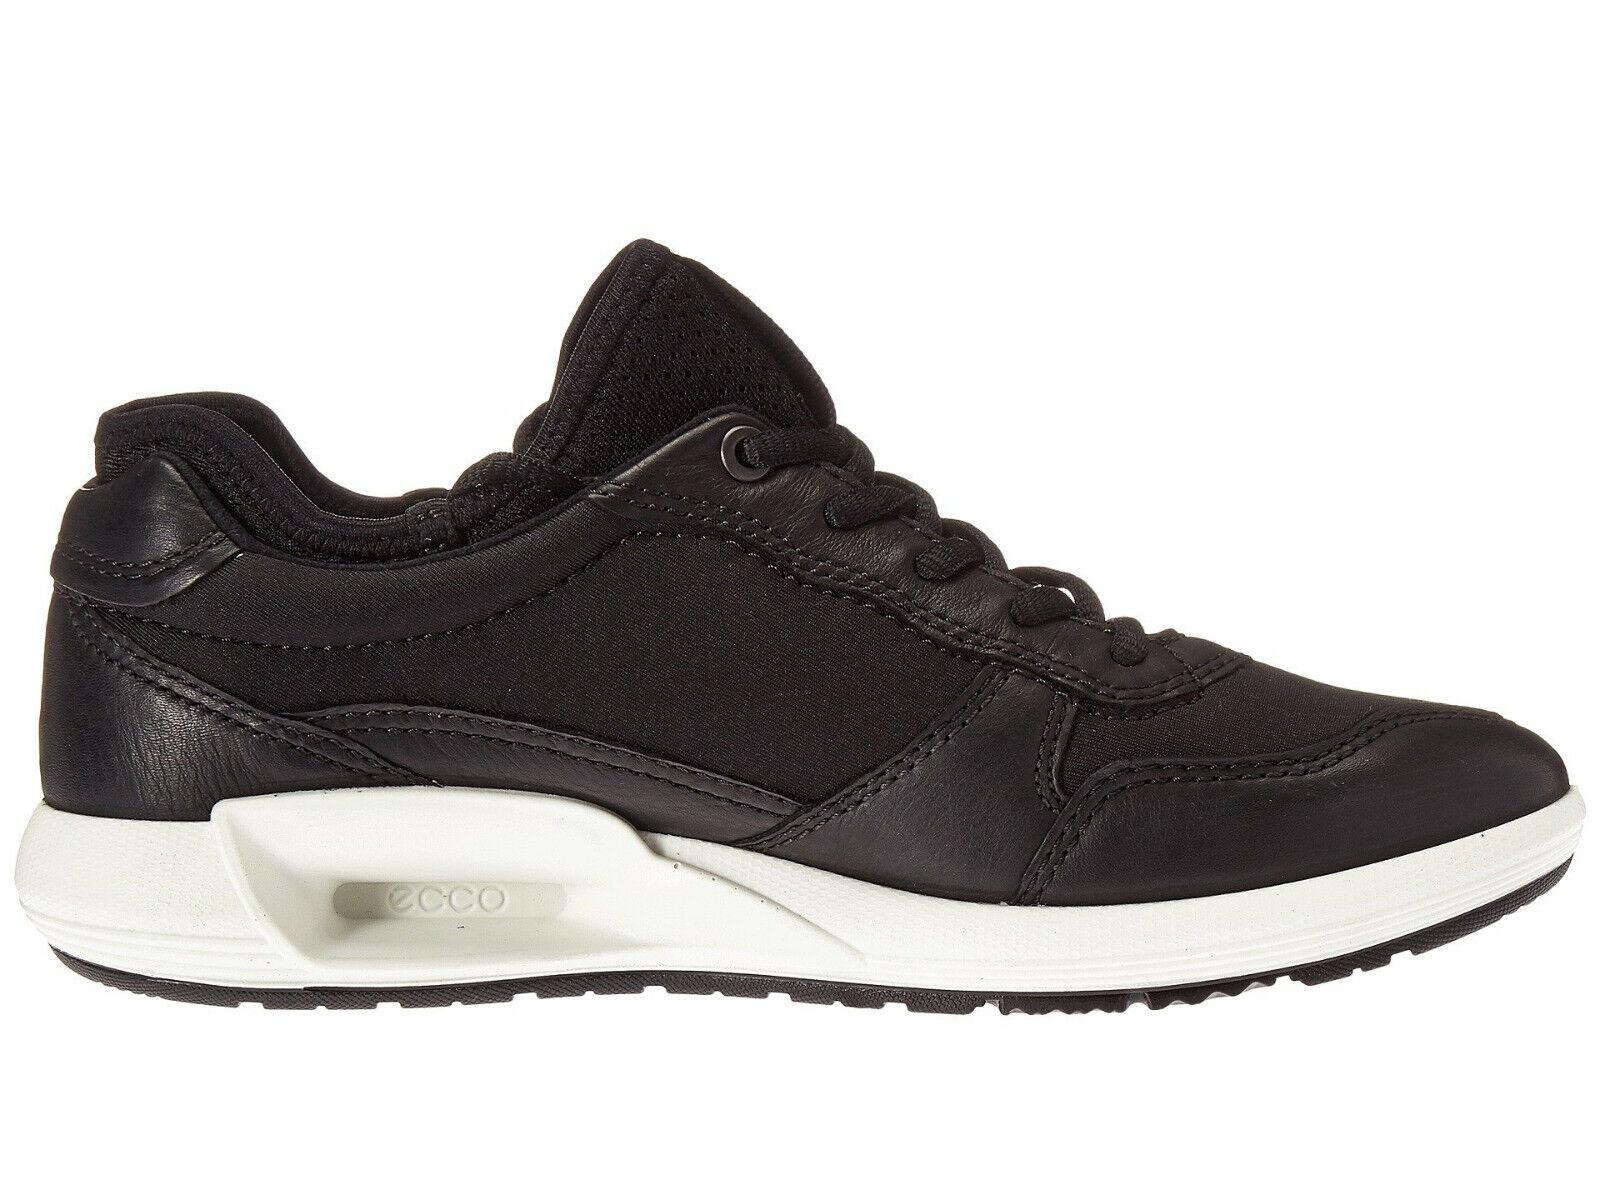 ECCO Womens  CS16 Low Lace Up Trainers Running Running Running Walking Trail Fashion shoes 0694e5